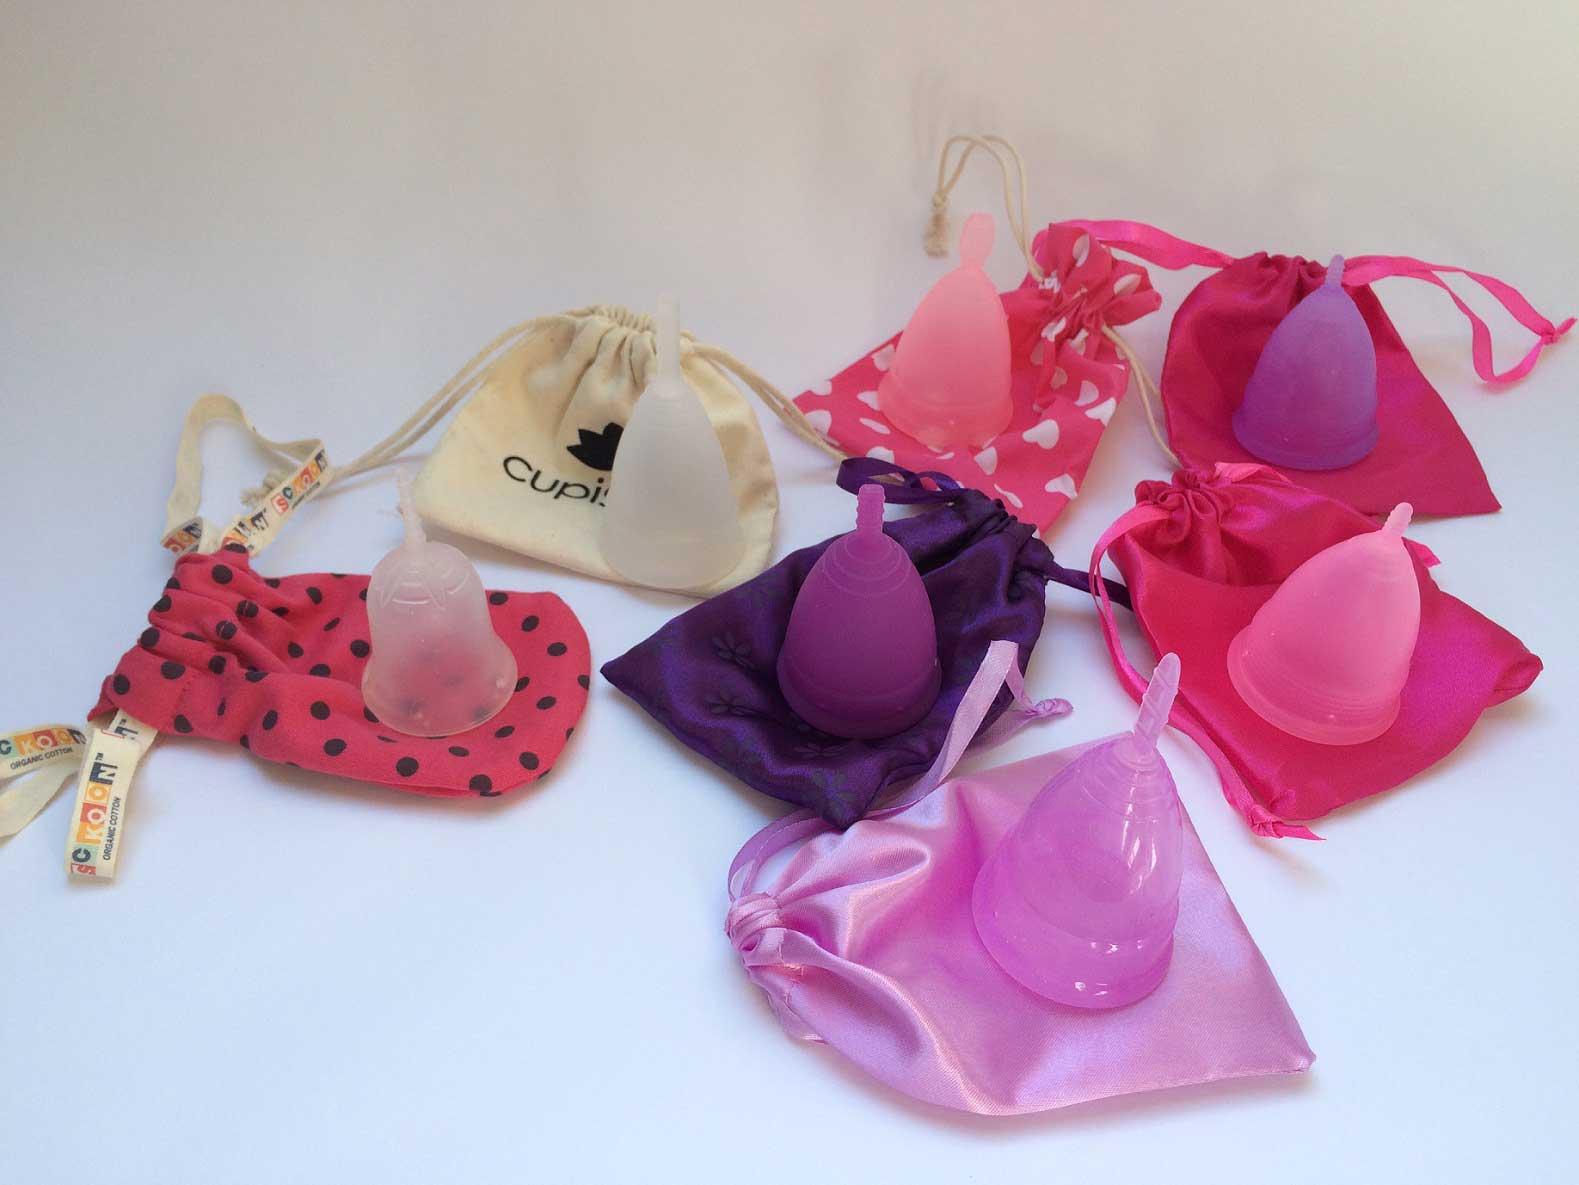 Menstruationstasse Testsieger